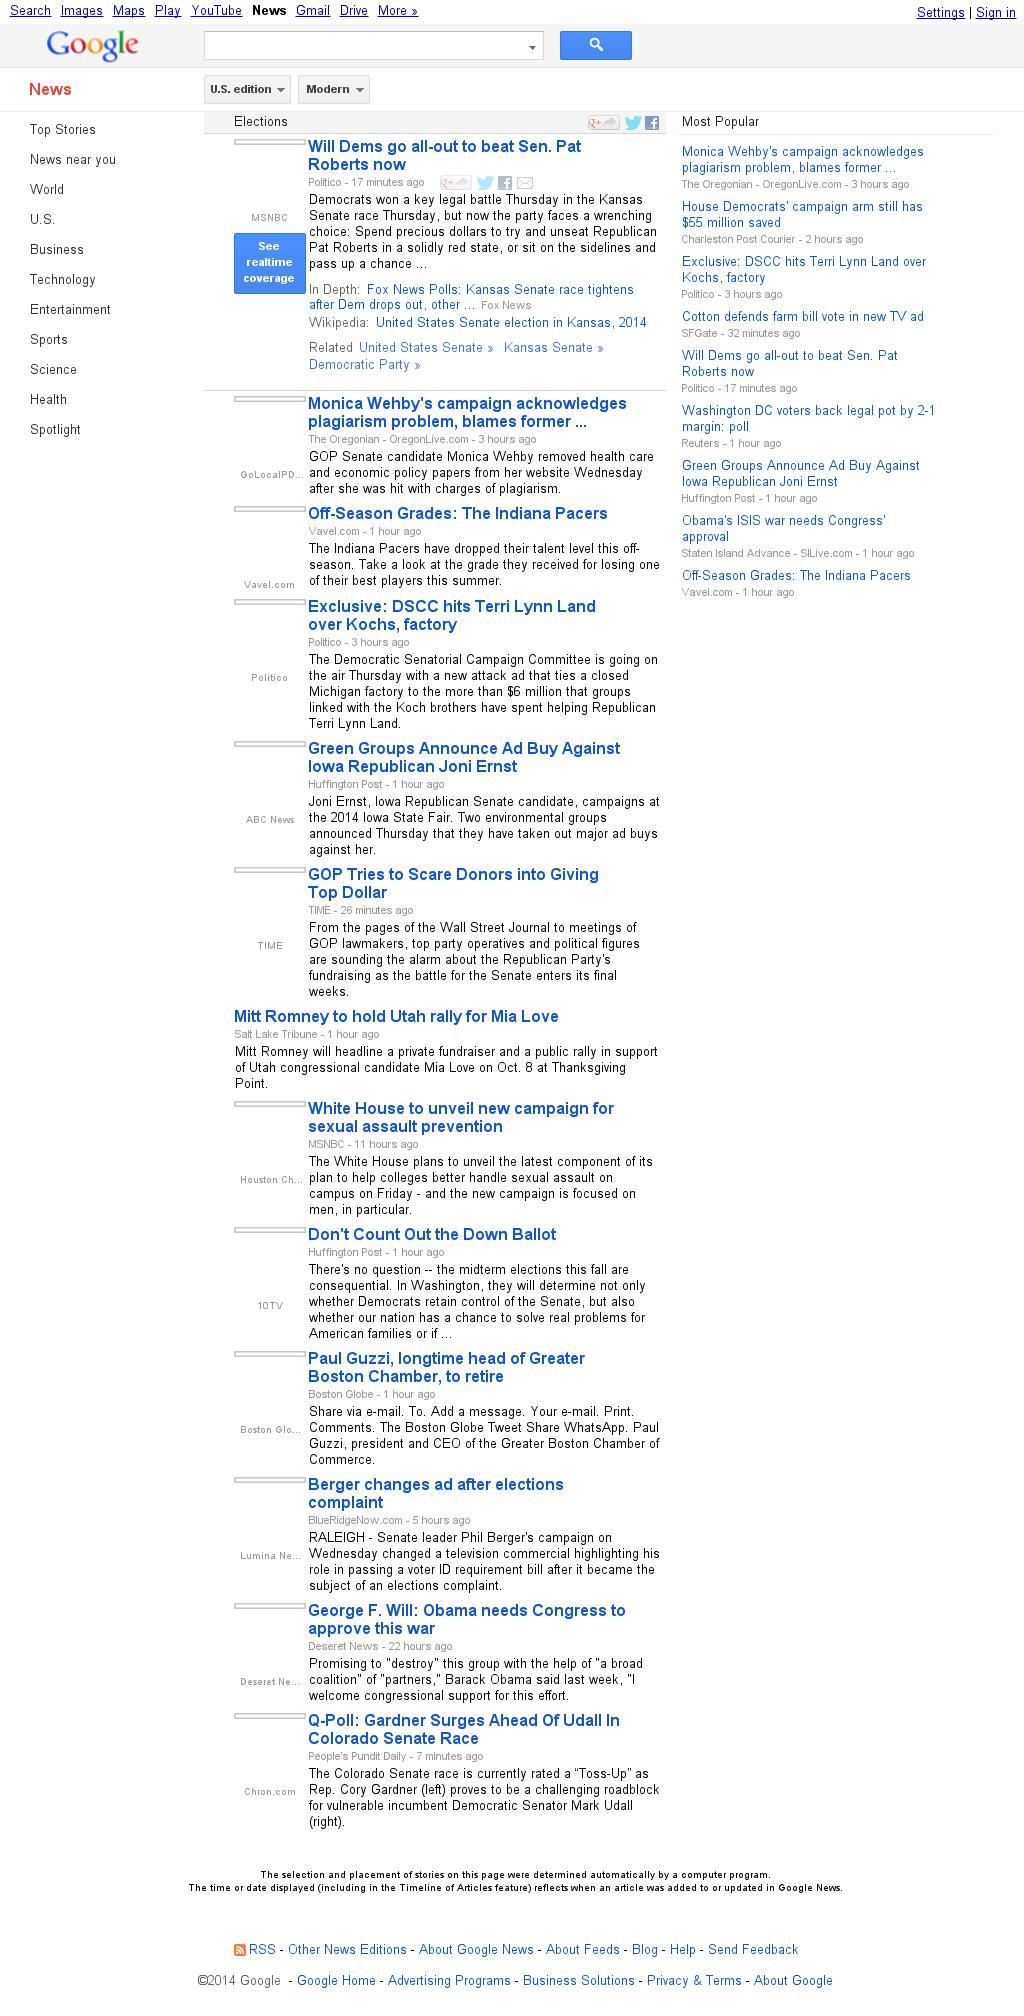 Google News: Elections at Thursday Sept. 18, 2014, 11:07 p.m. UTC